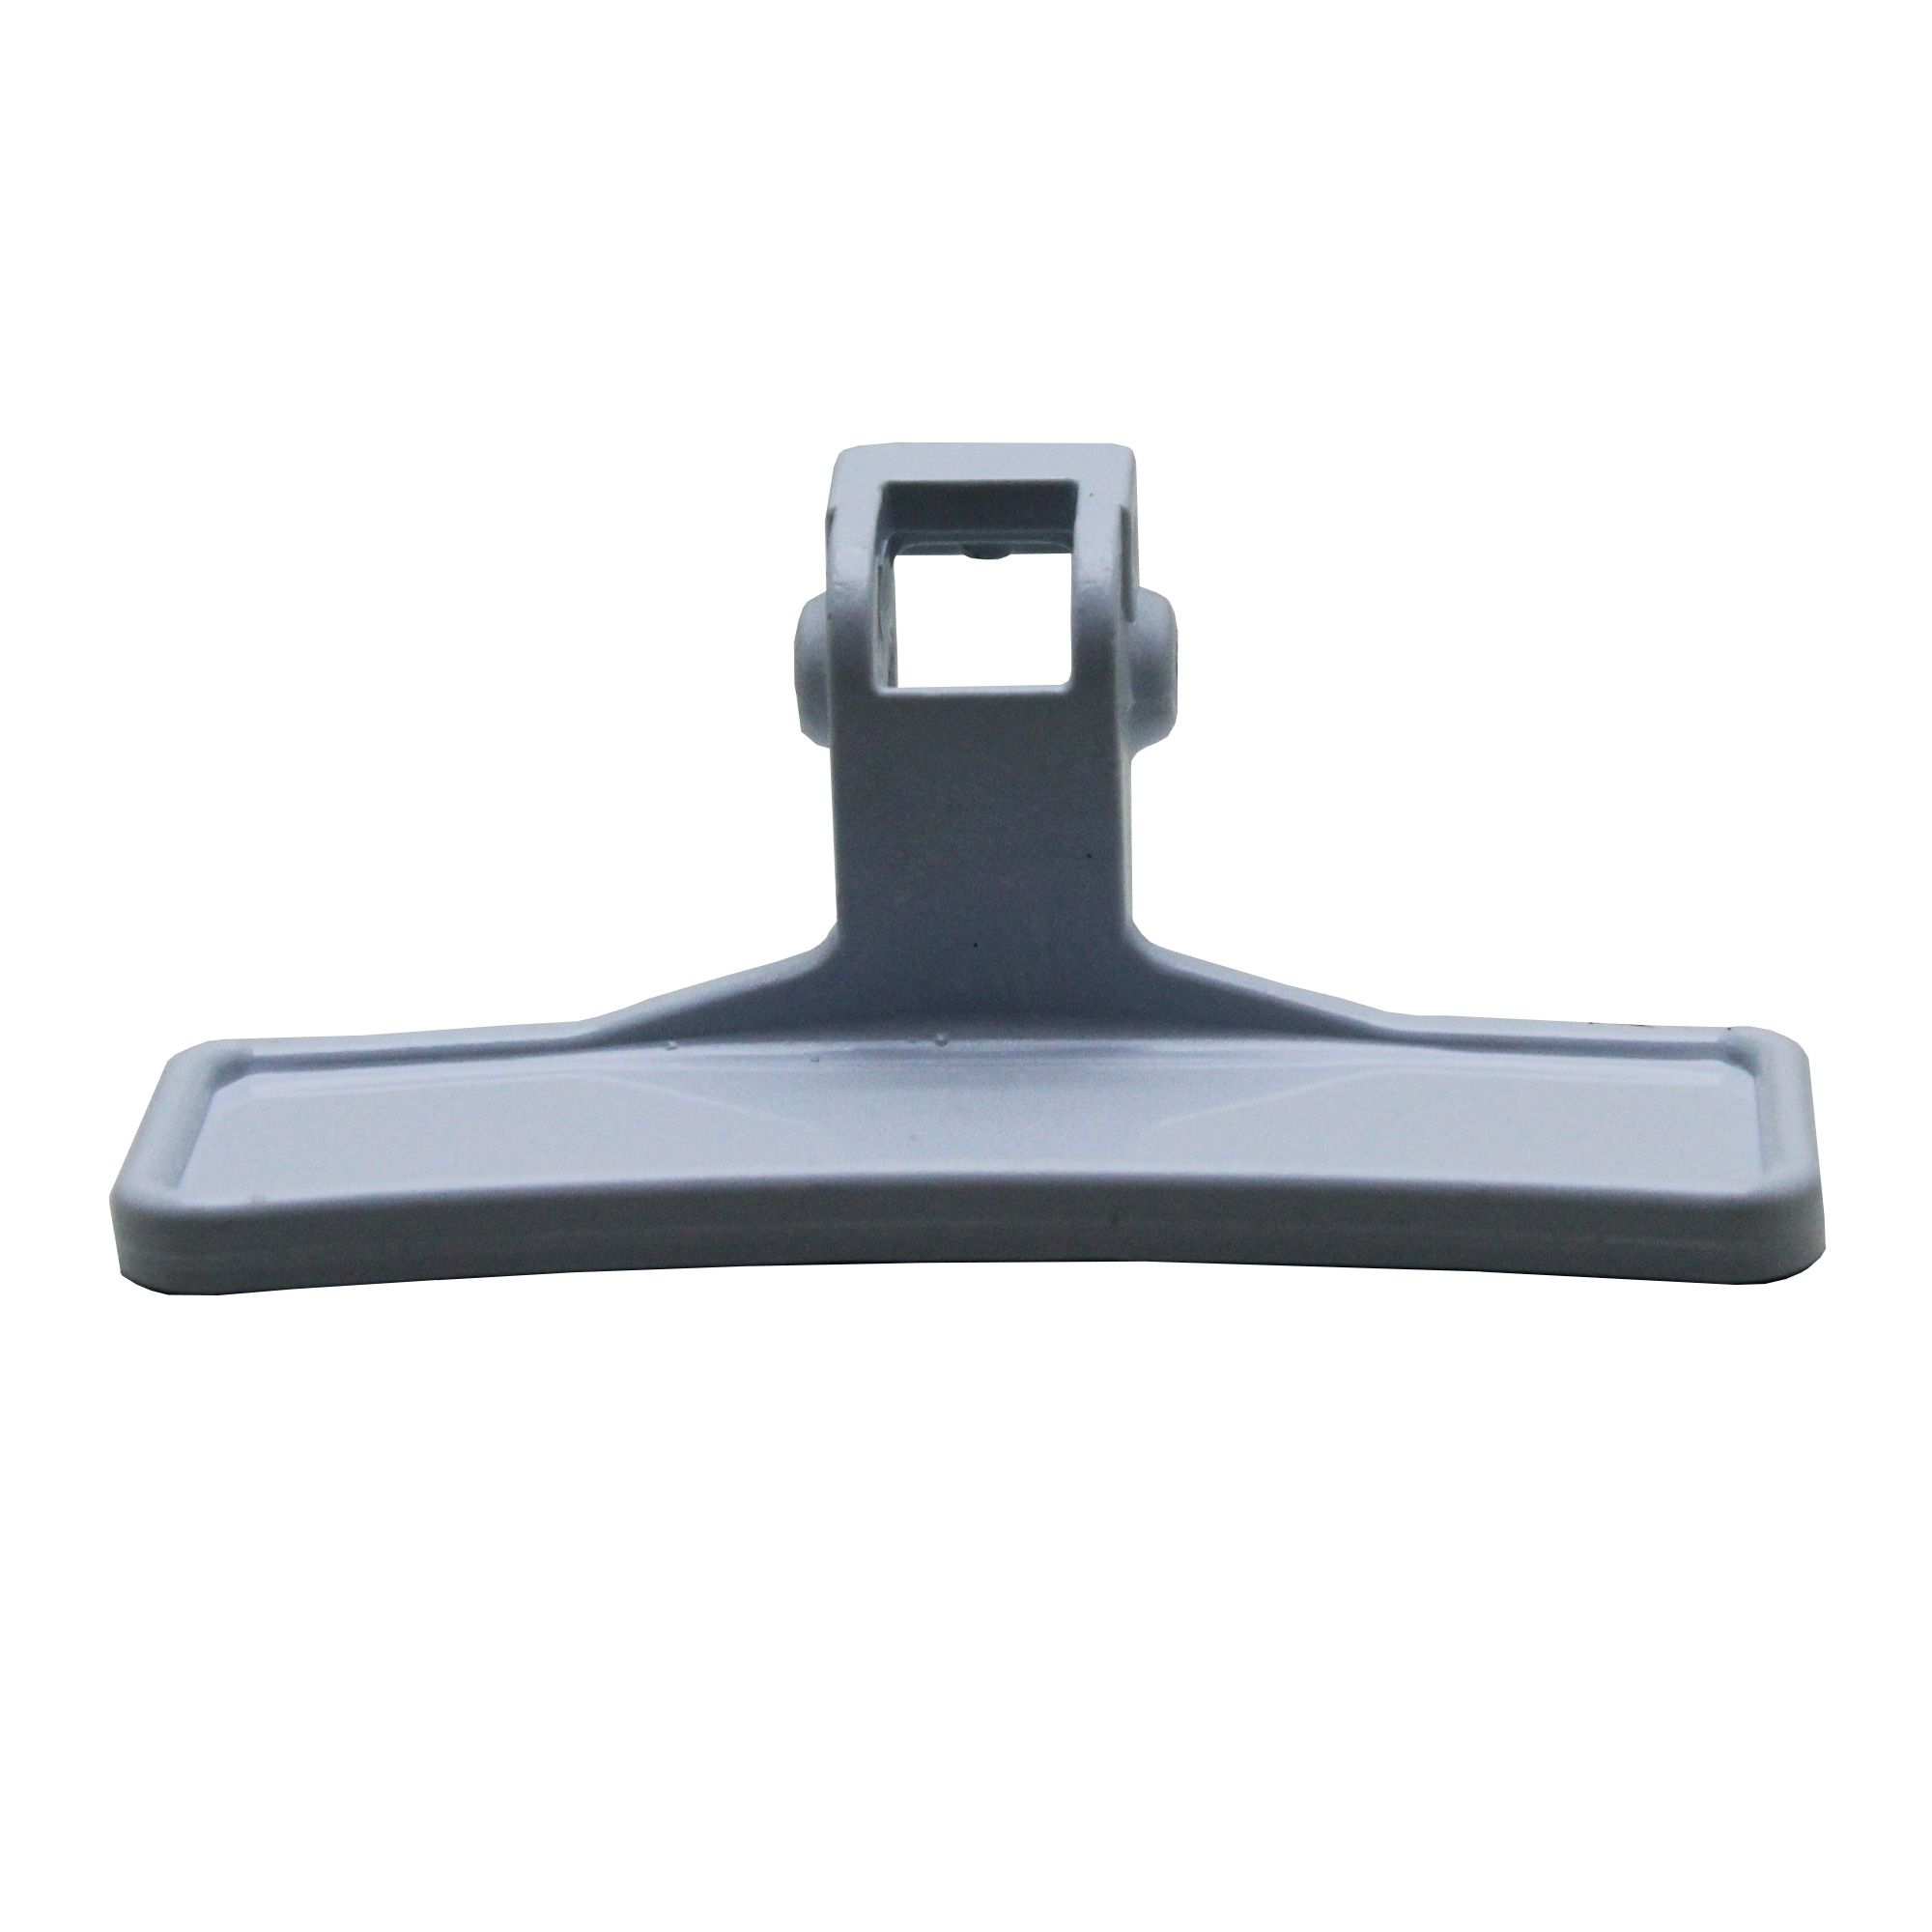 Puxador Porta Lava Seca Electrolux 12608200